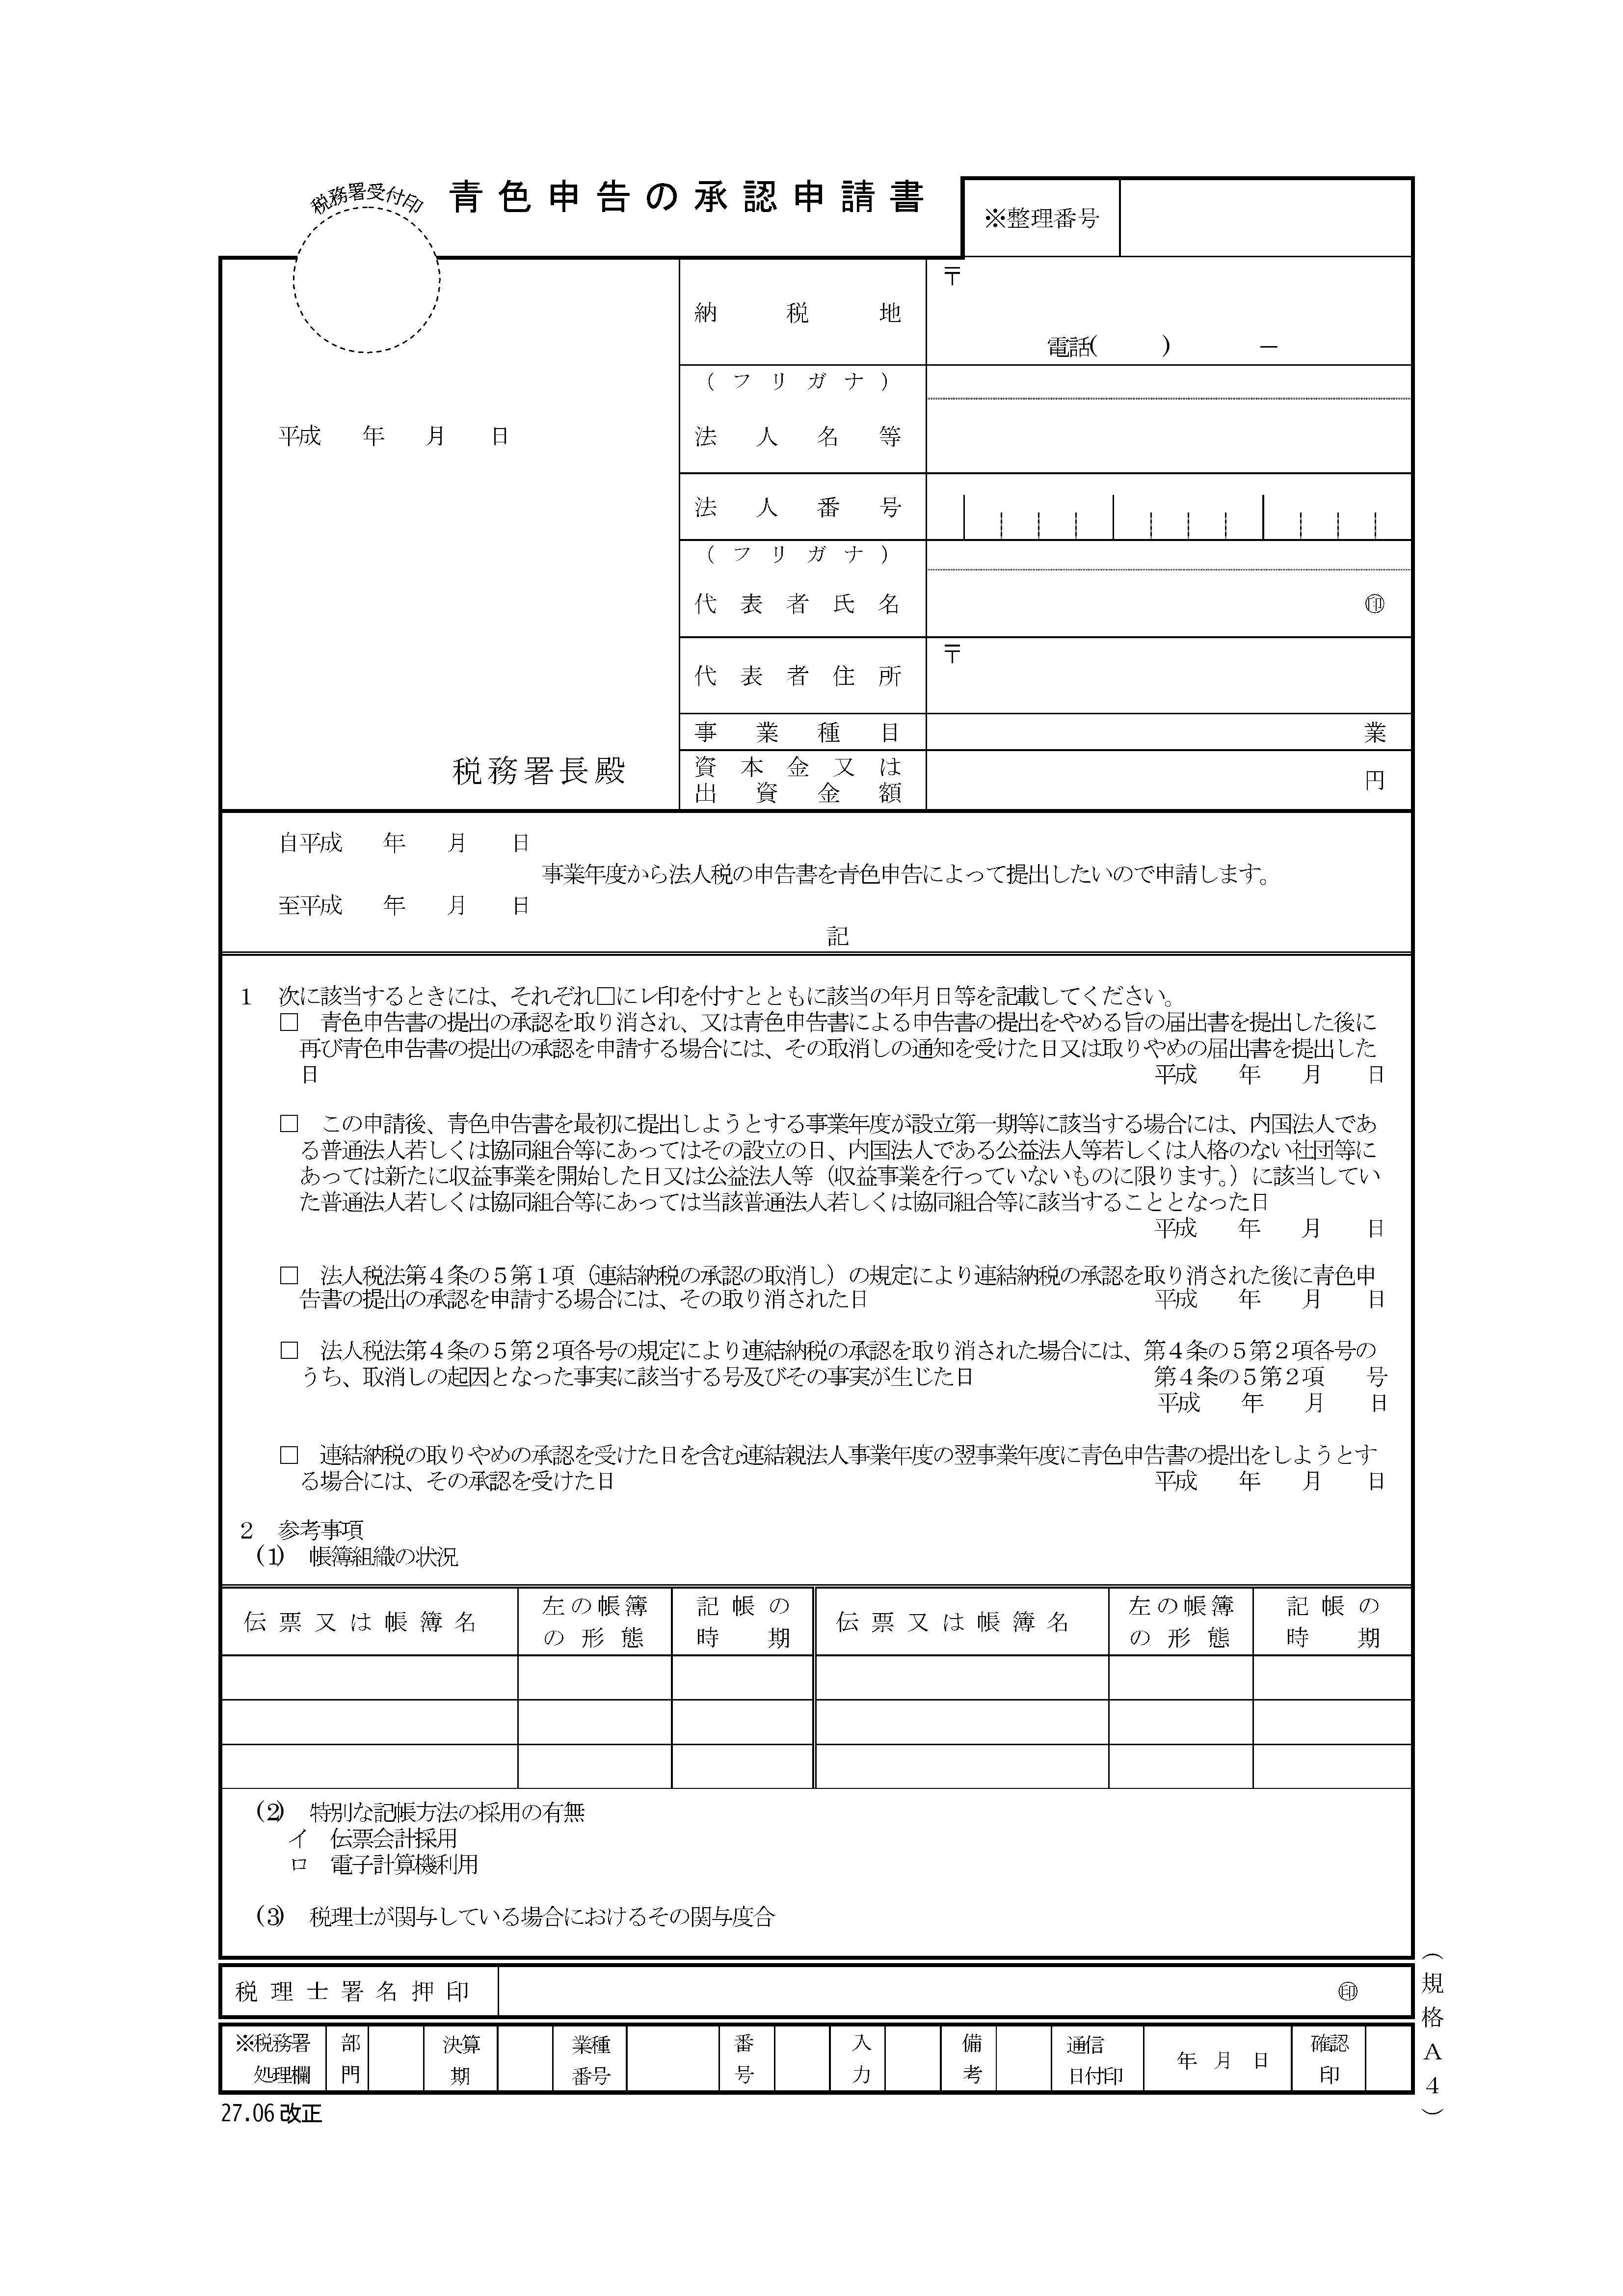 青色申告承認申請書.jpg